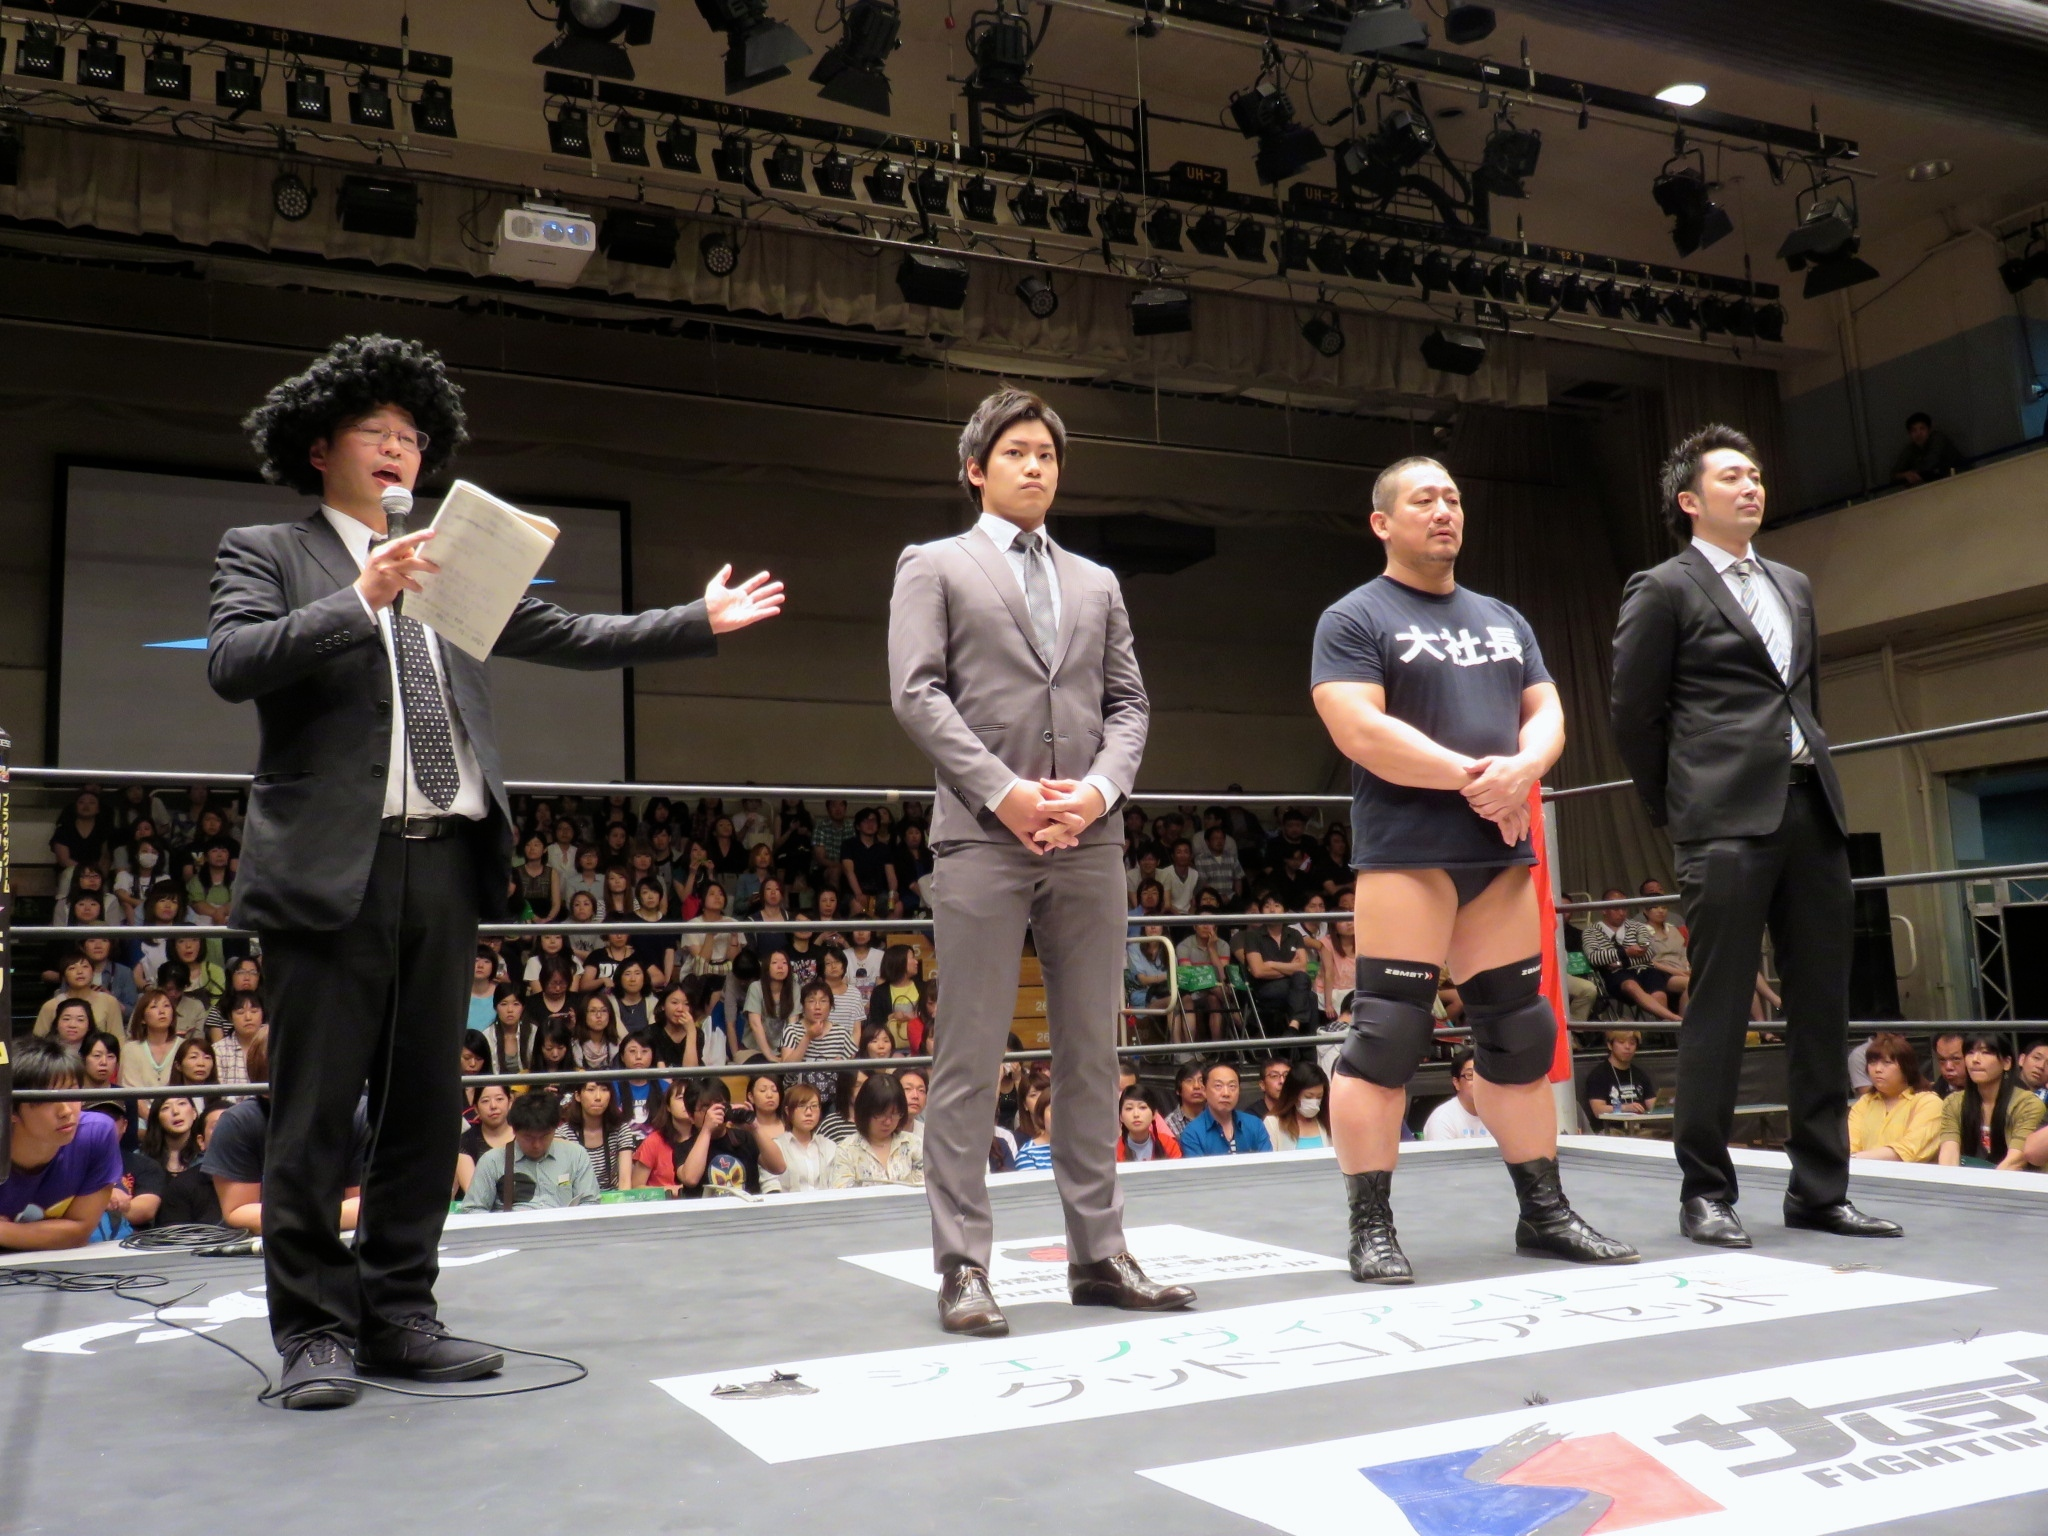 http://news.yoshimoto.co.jp/photos/uncategorized/2015/05/31/20150531173018-5b603055b4b29ed1db27c9a71ba7fc2d29353812.jpg